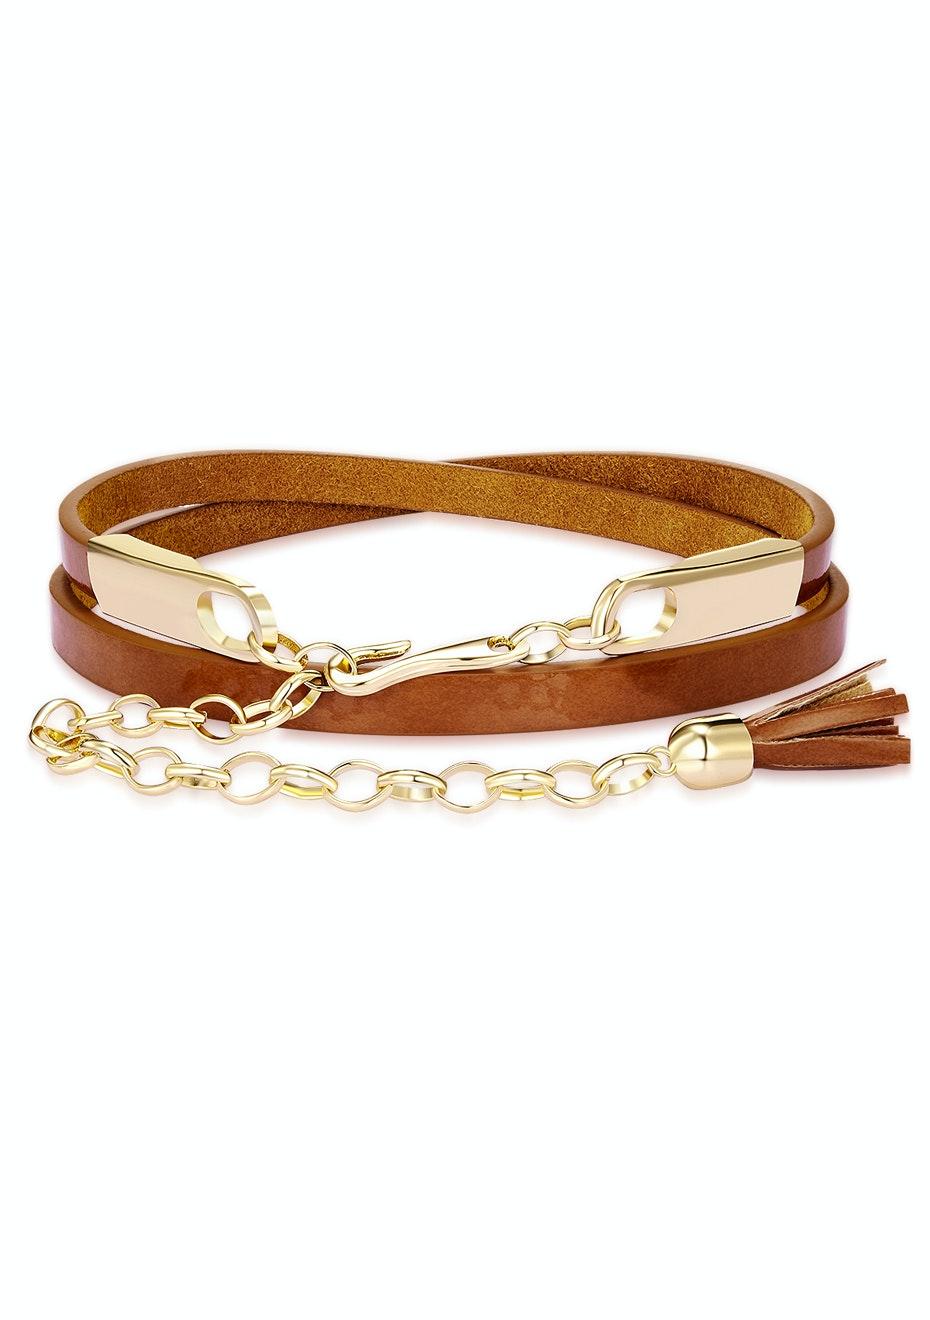 Genuine Cow Leather Skinny Waist Belt-Jasmine brown